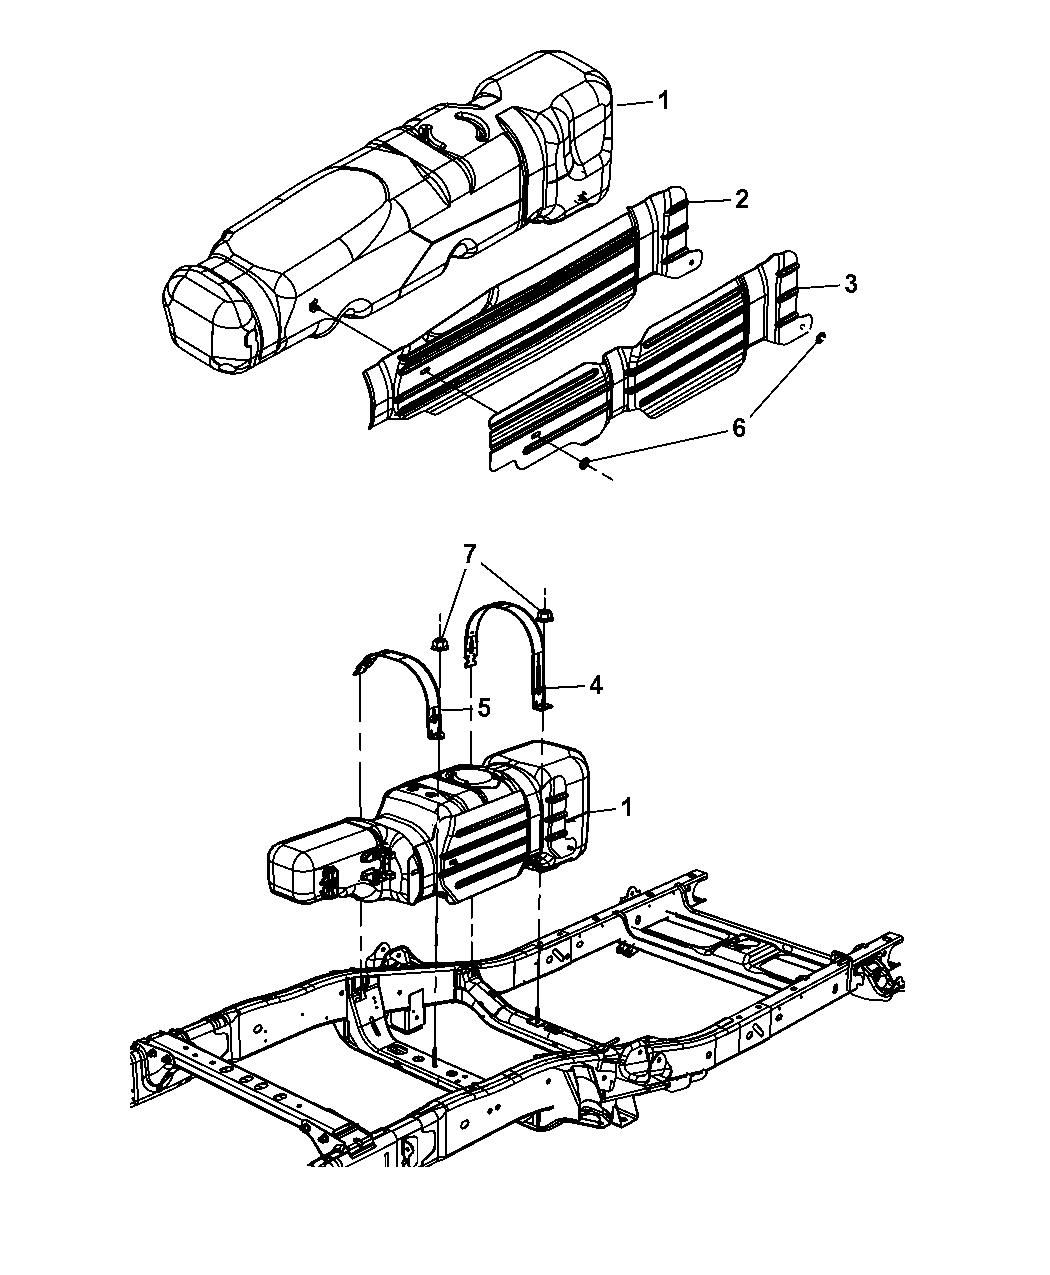 Dodge Ram Fuel Tank Amp Related